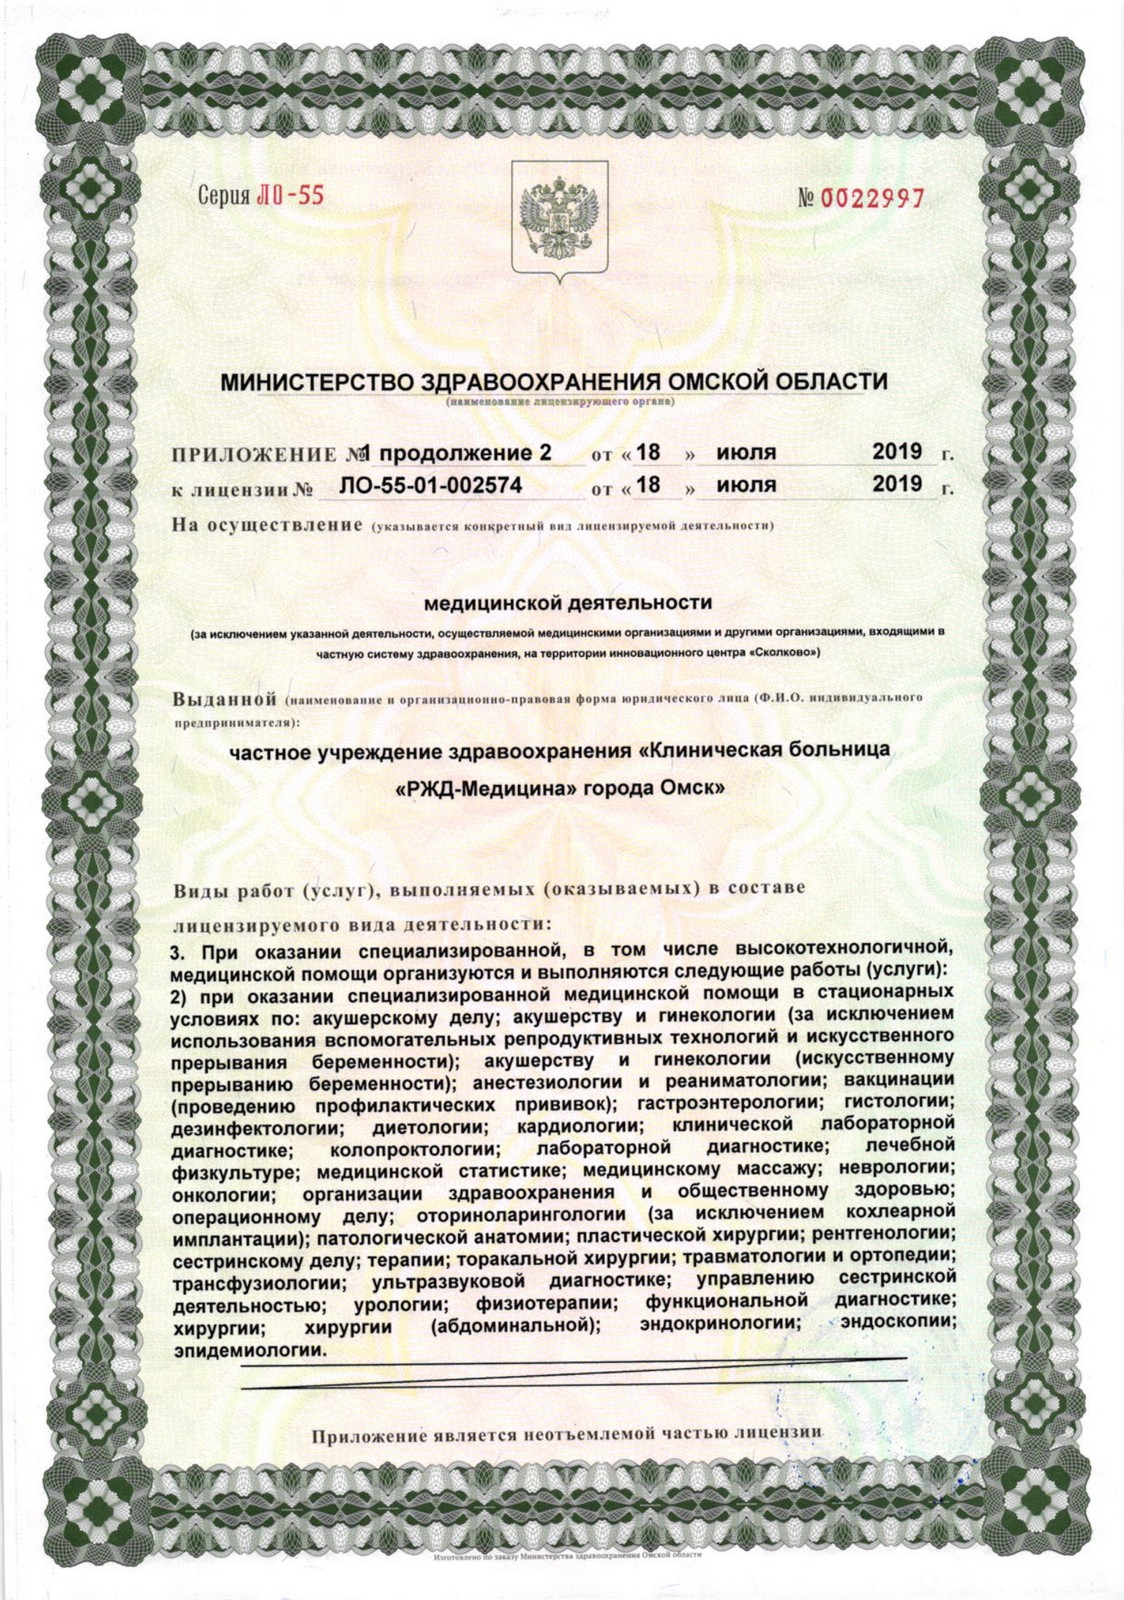 License-2019-07-18_15